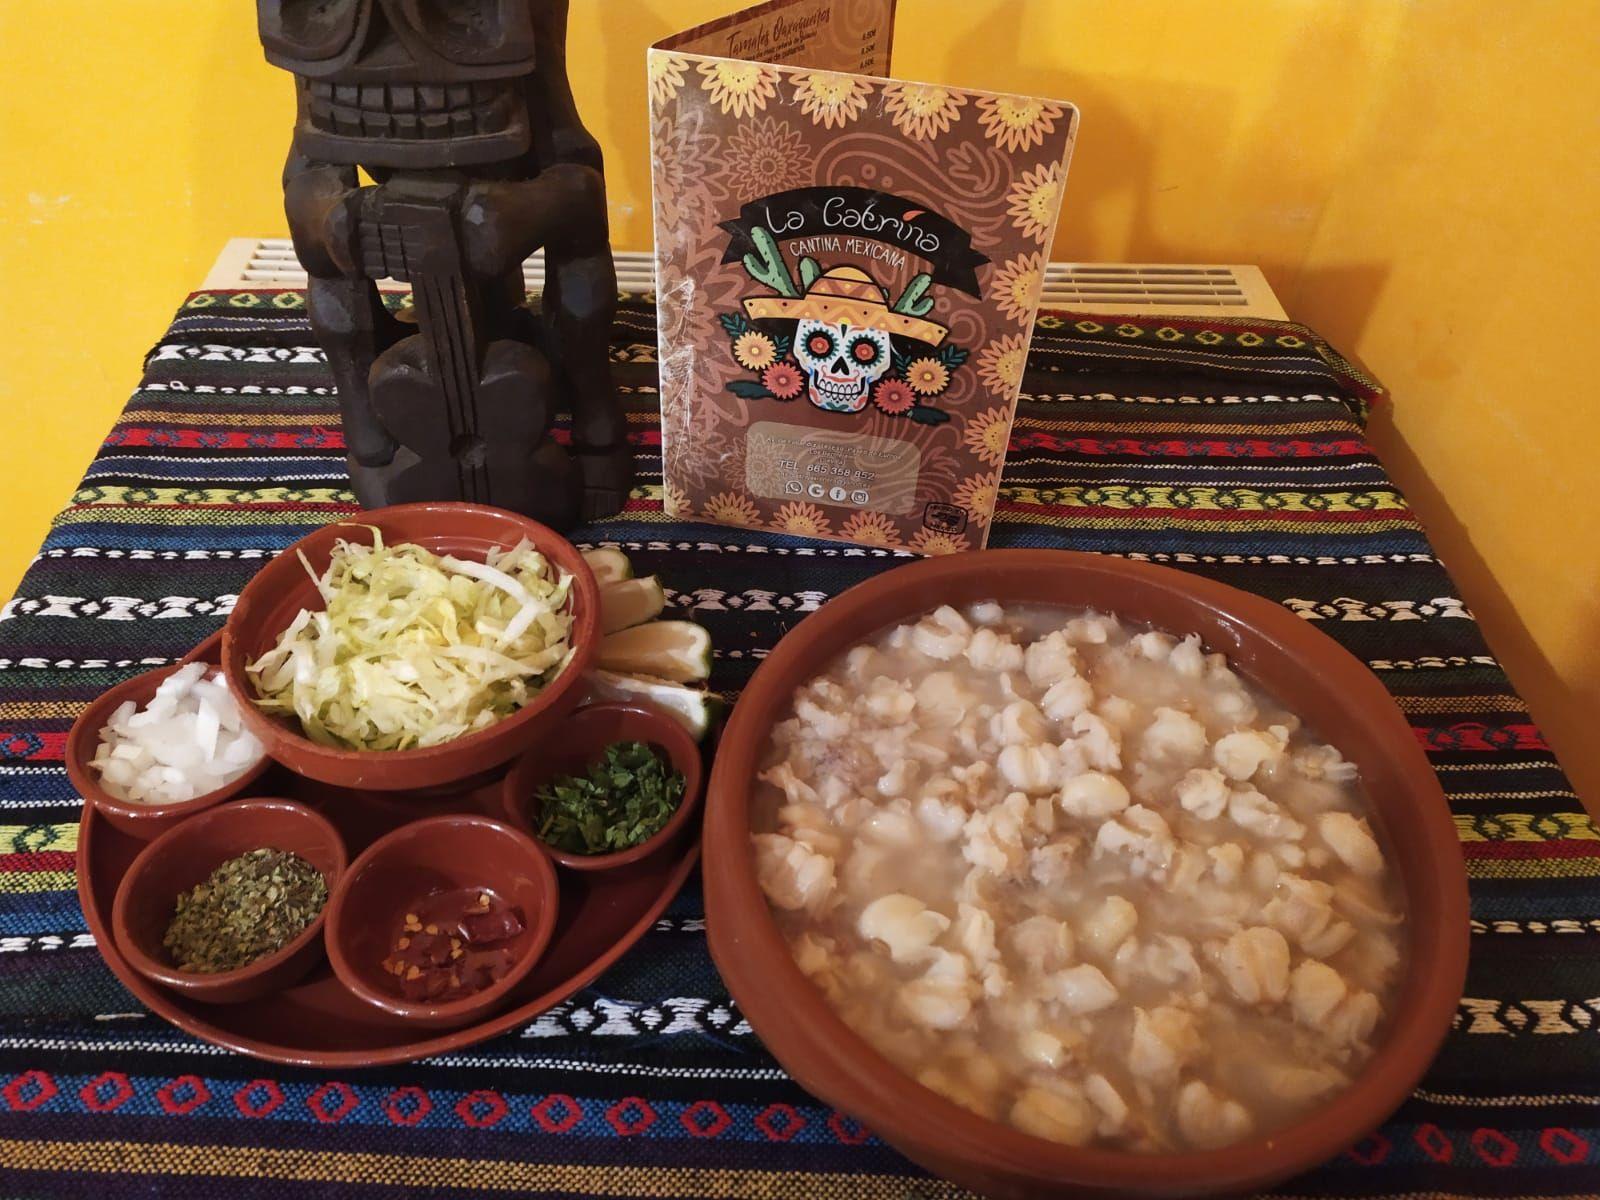 Foto 4 de Restaurante mexicano en  | Cantina La Catrina